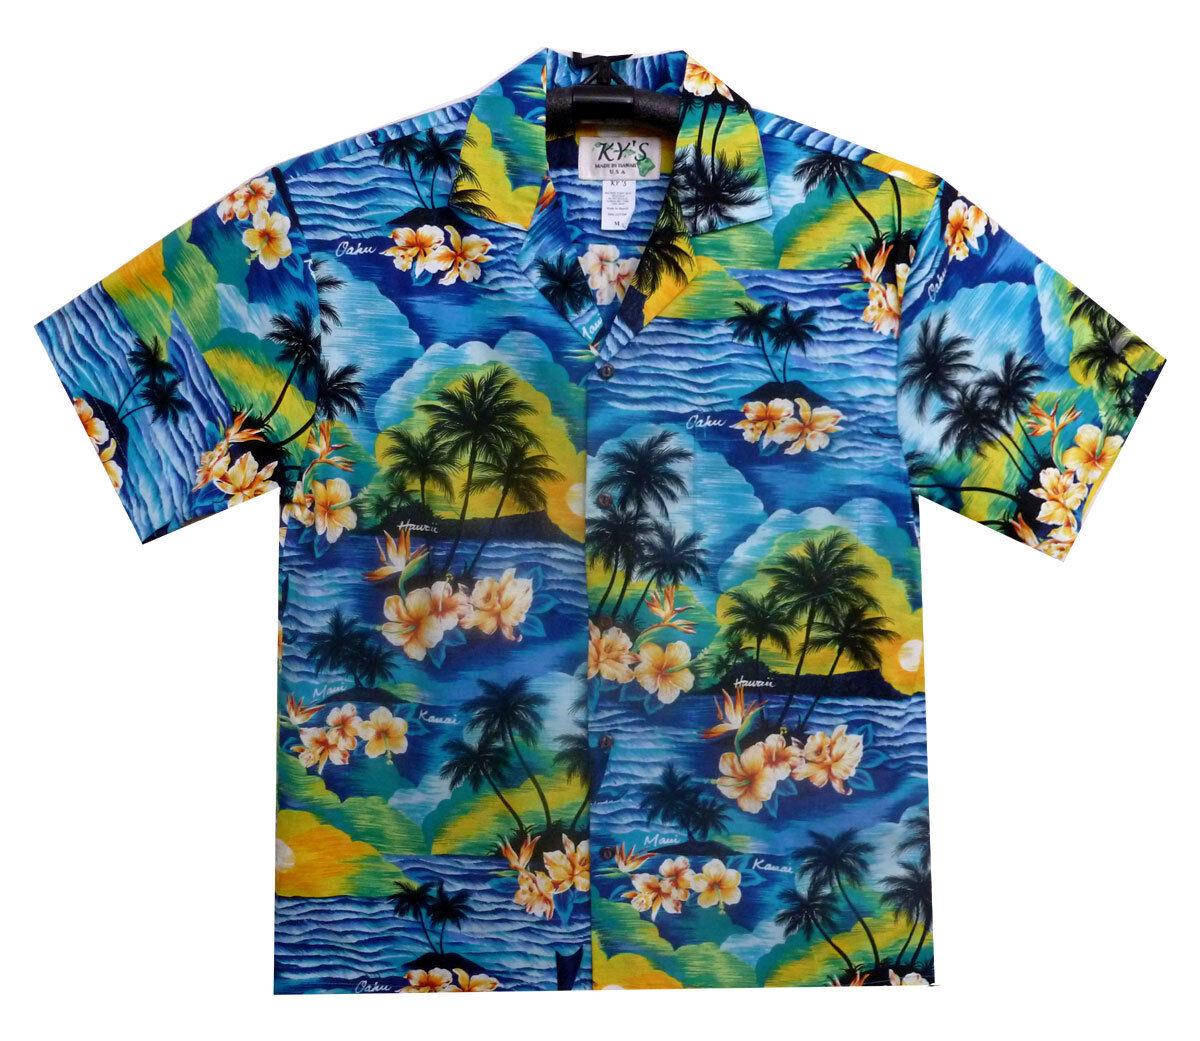 Ky 'S ORIGINALE Camicia Hawaii, Blu isole Hawaii, s-3xl - disponibilità limitata -